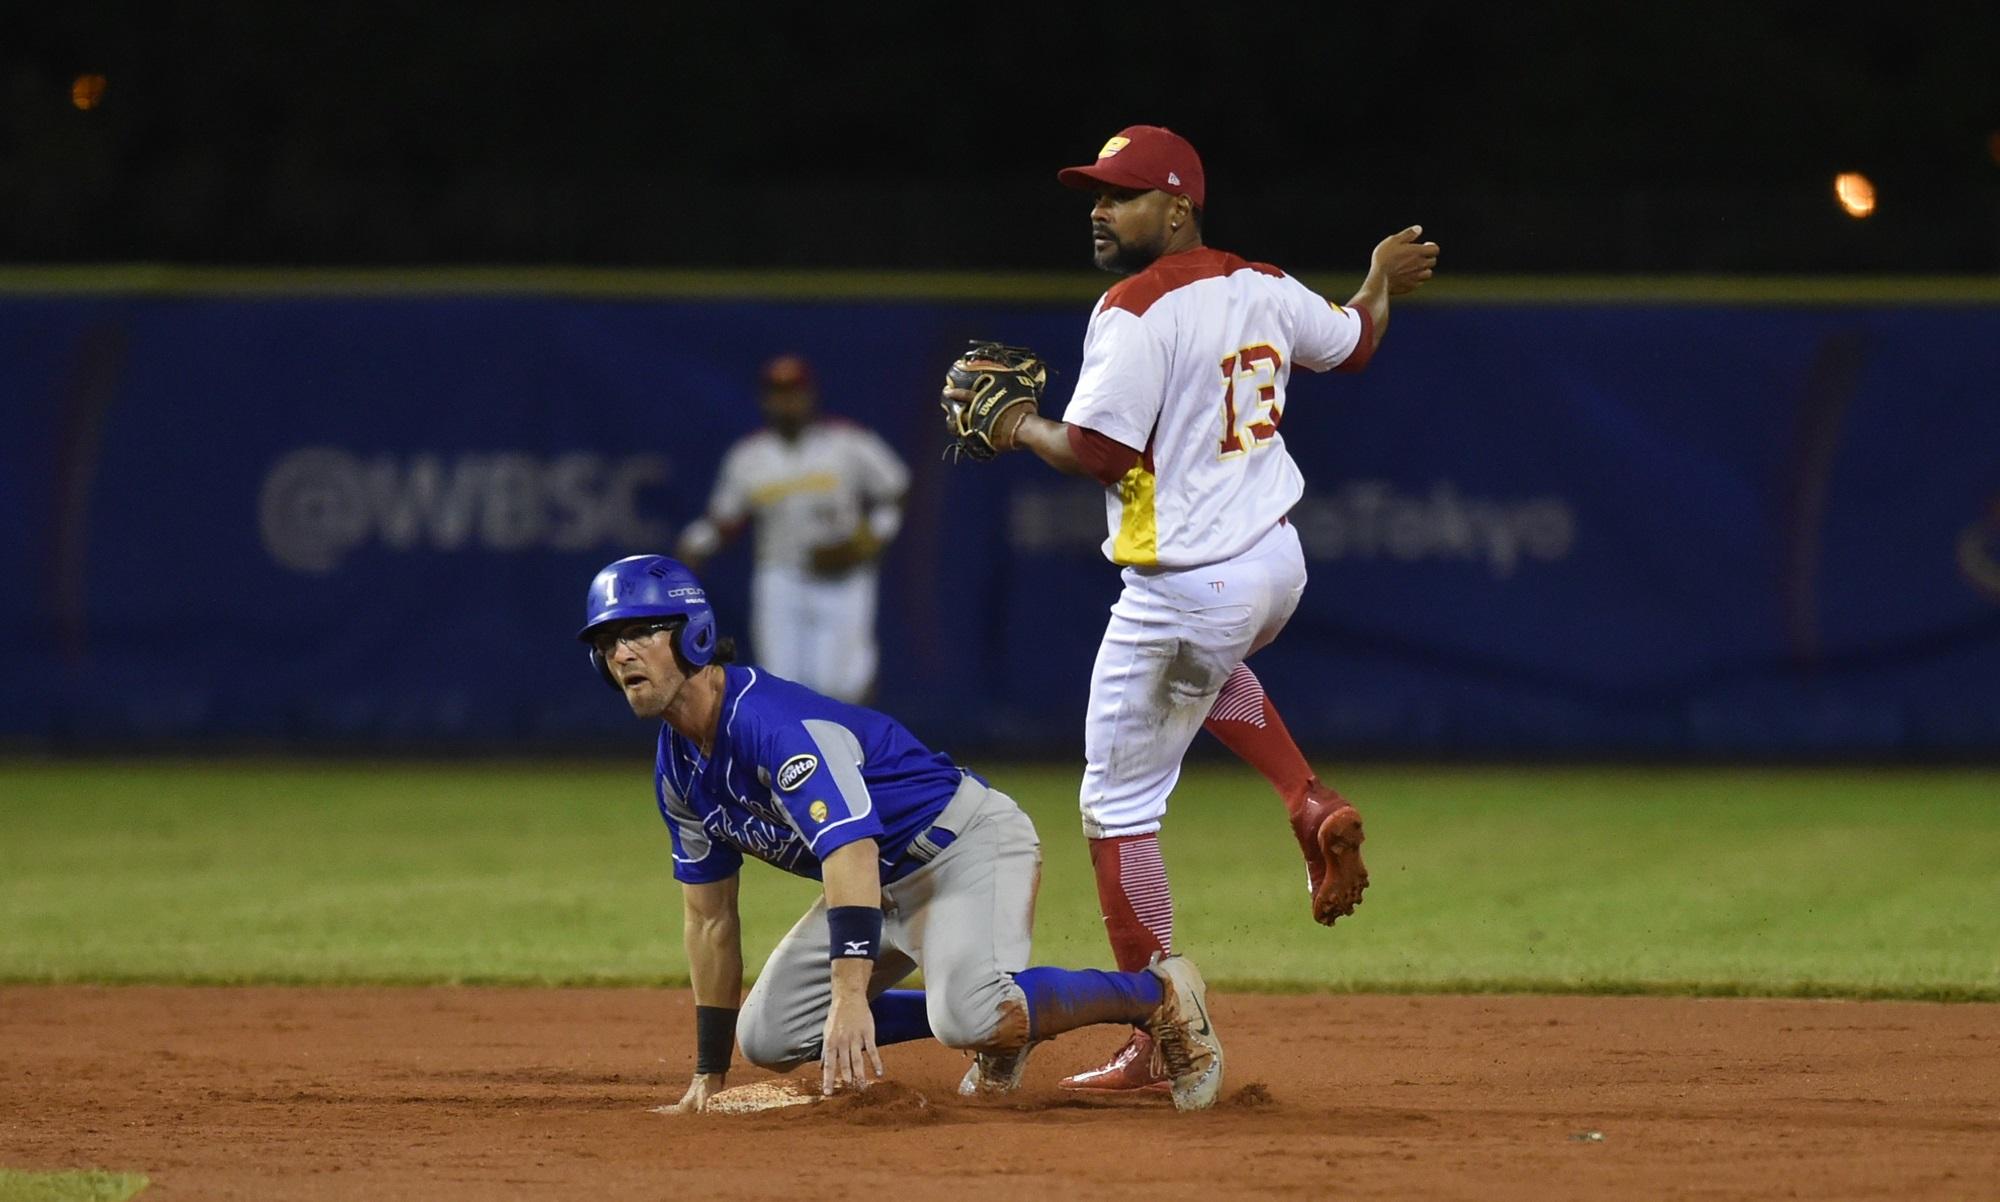 Spain won the one-run game